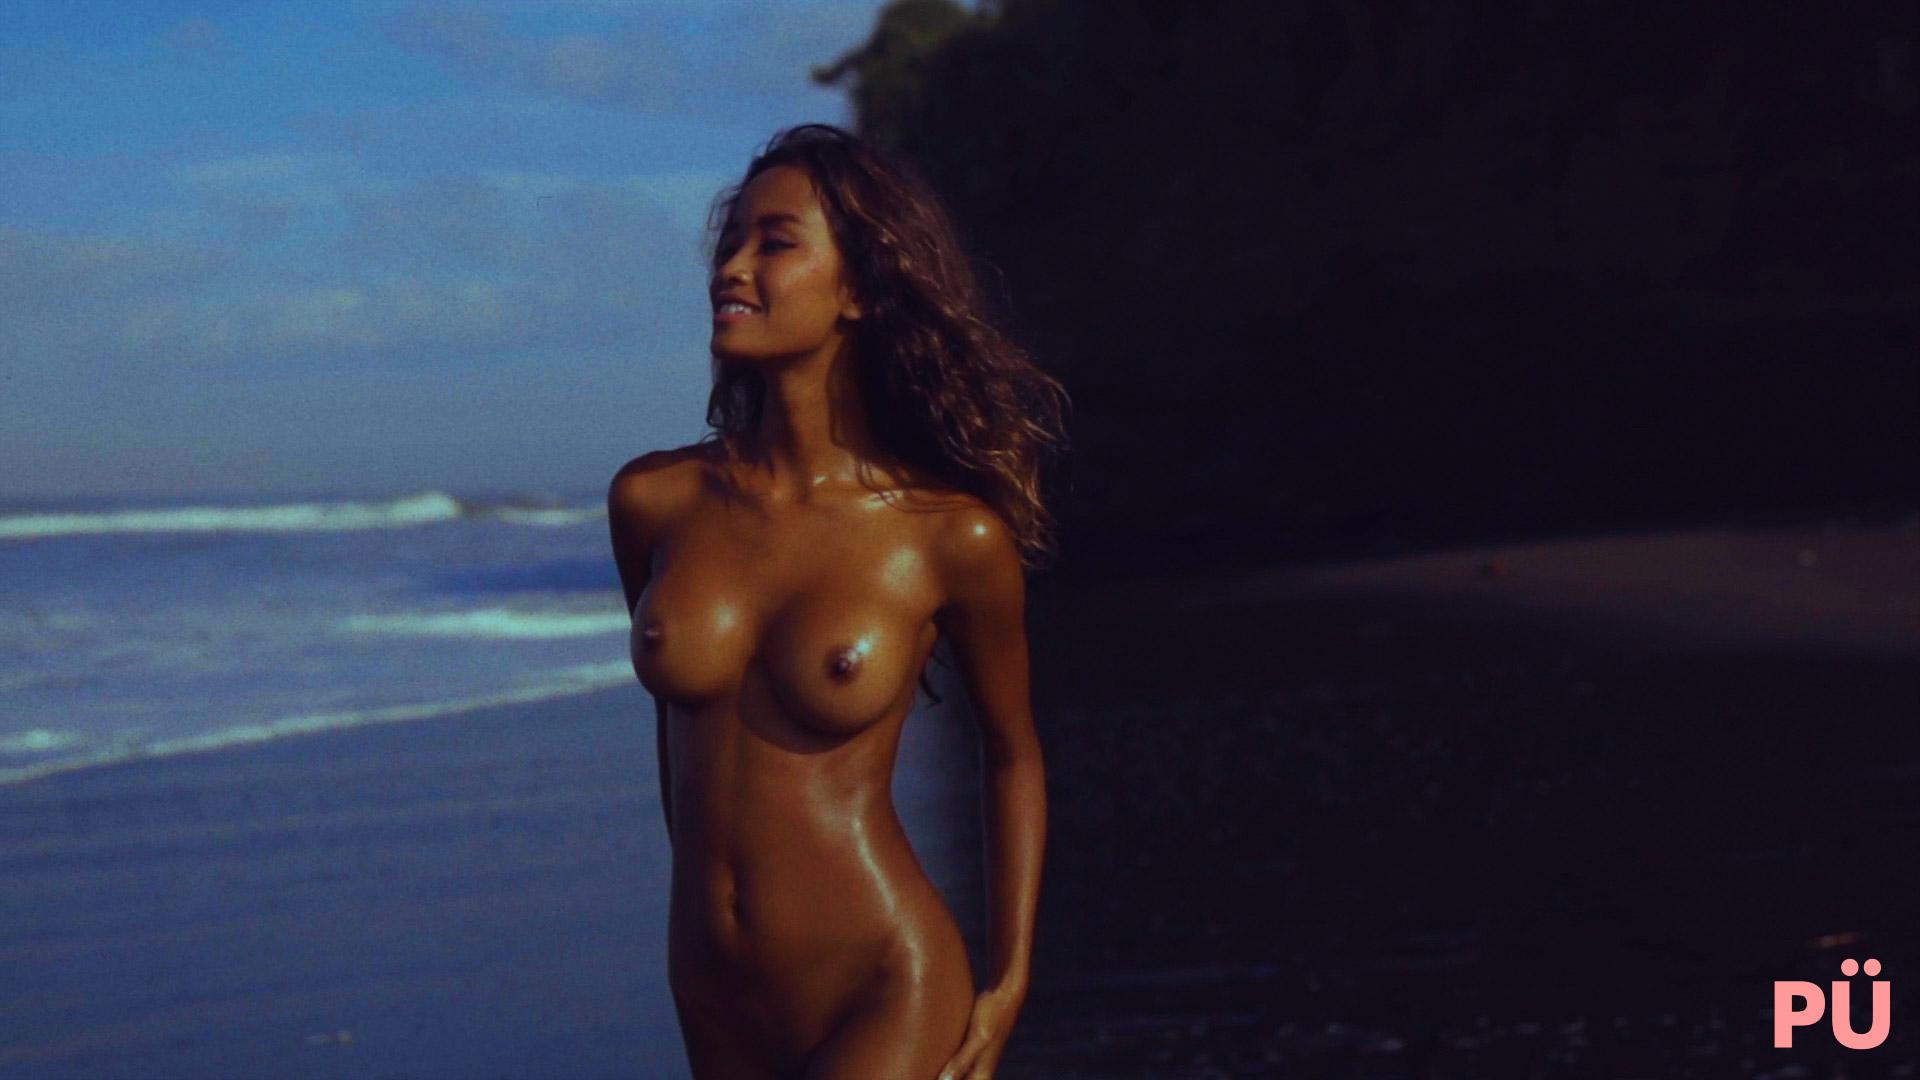 018-Black-Oilie-Sand.00_04_48_16.Still051.jpg